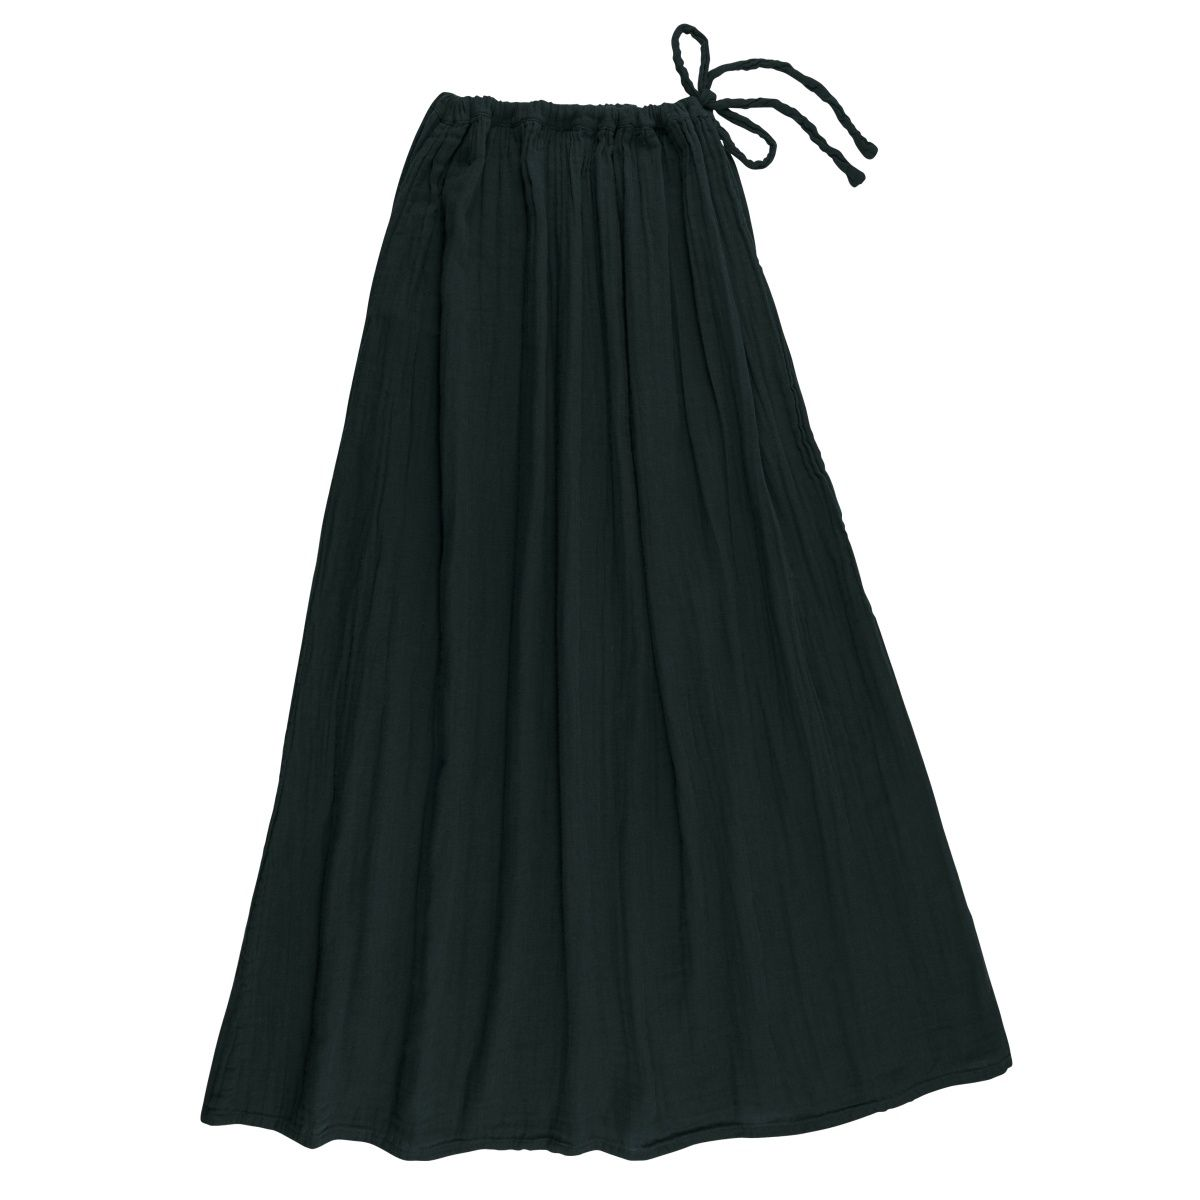 Numero 74 Skirt for mum Ava long dark grey